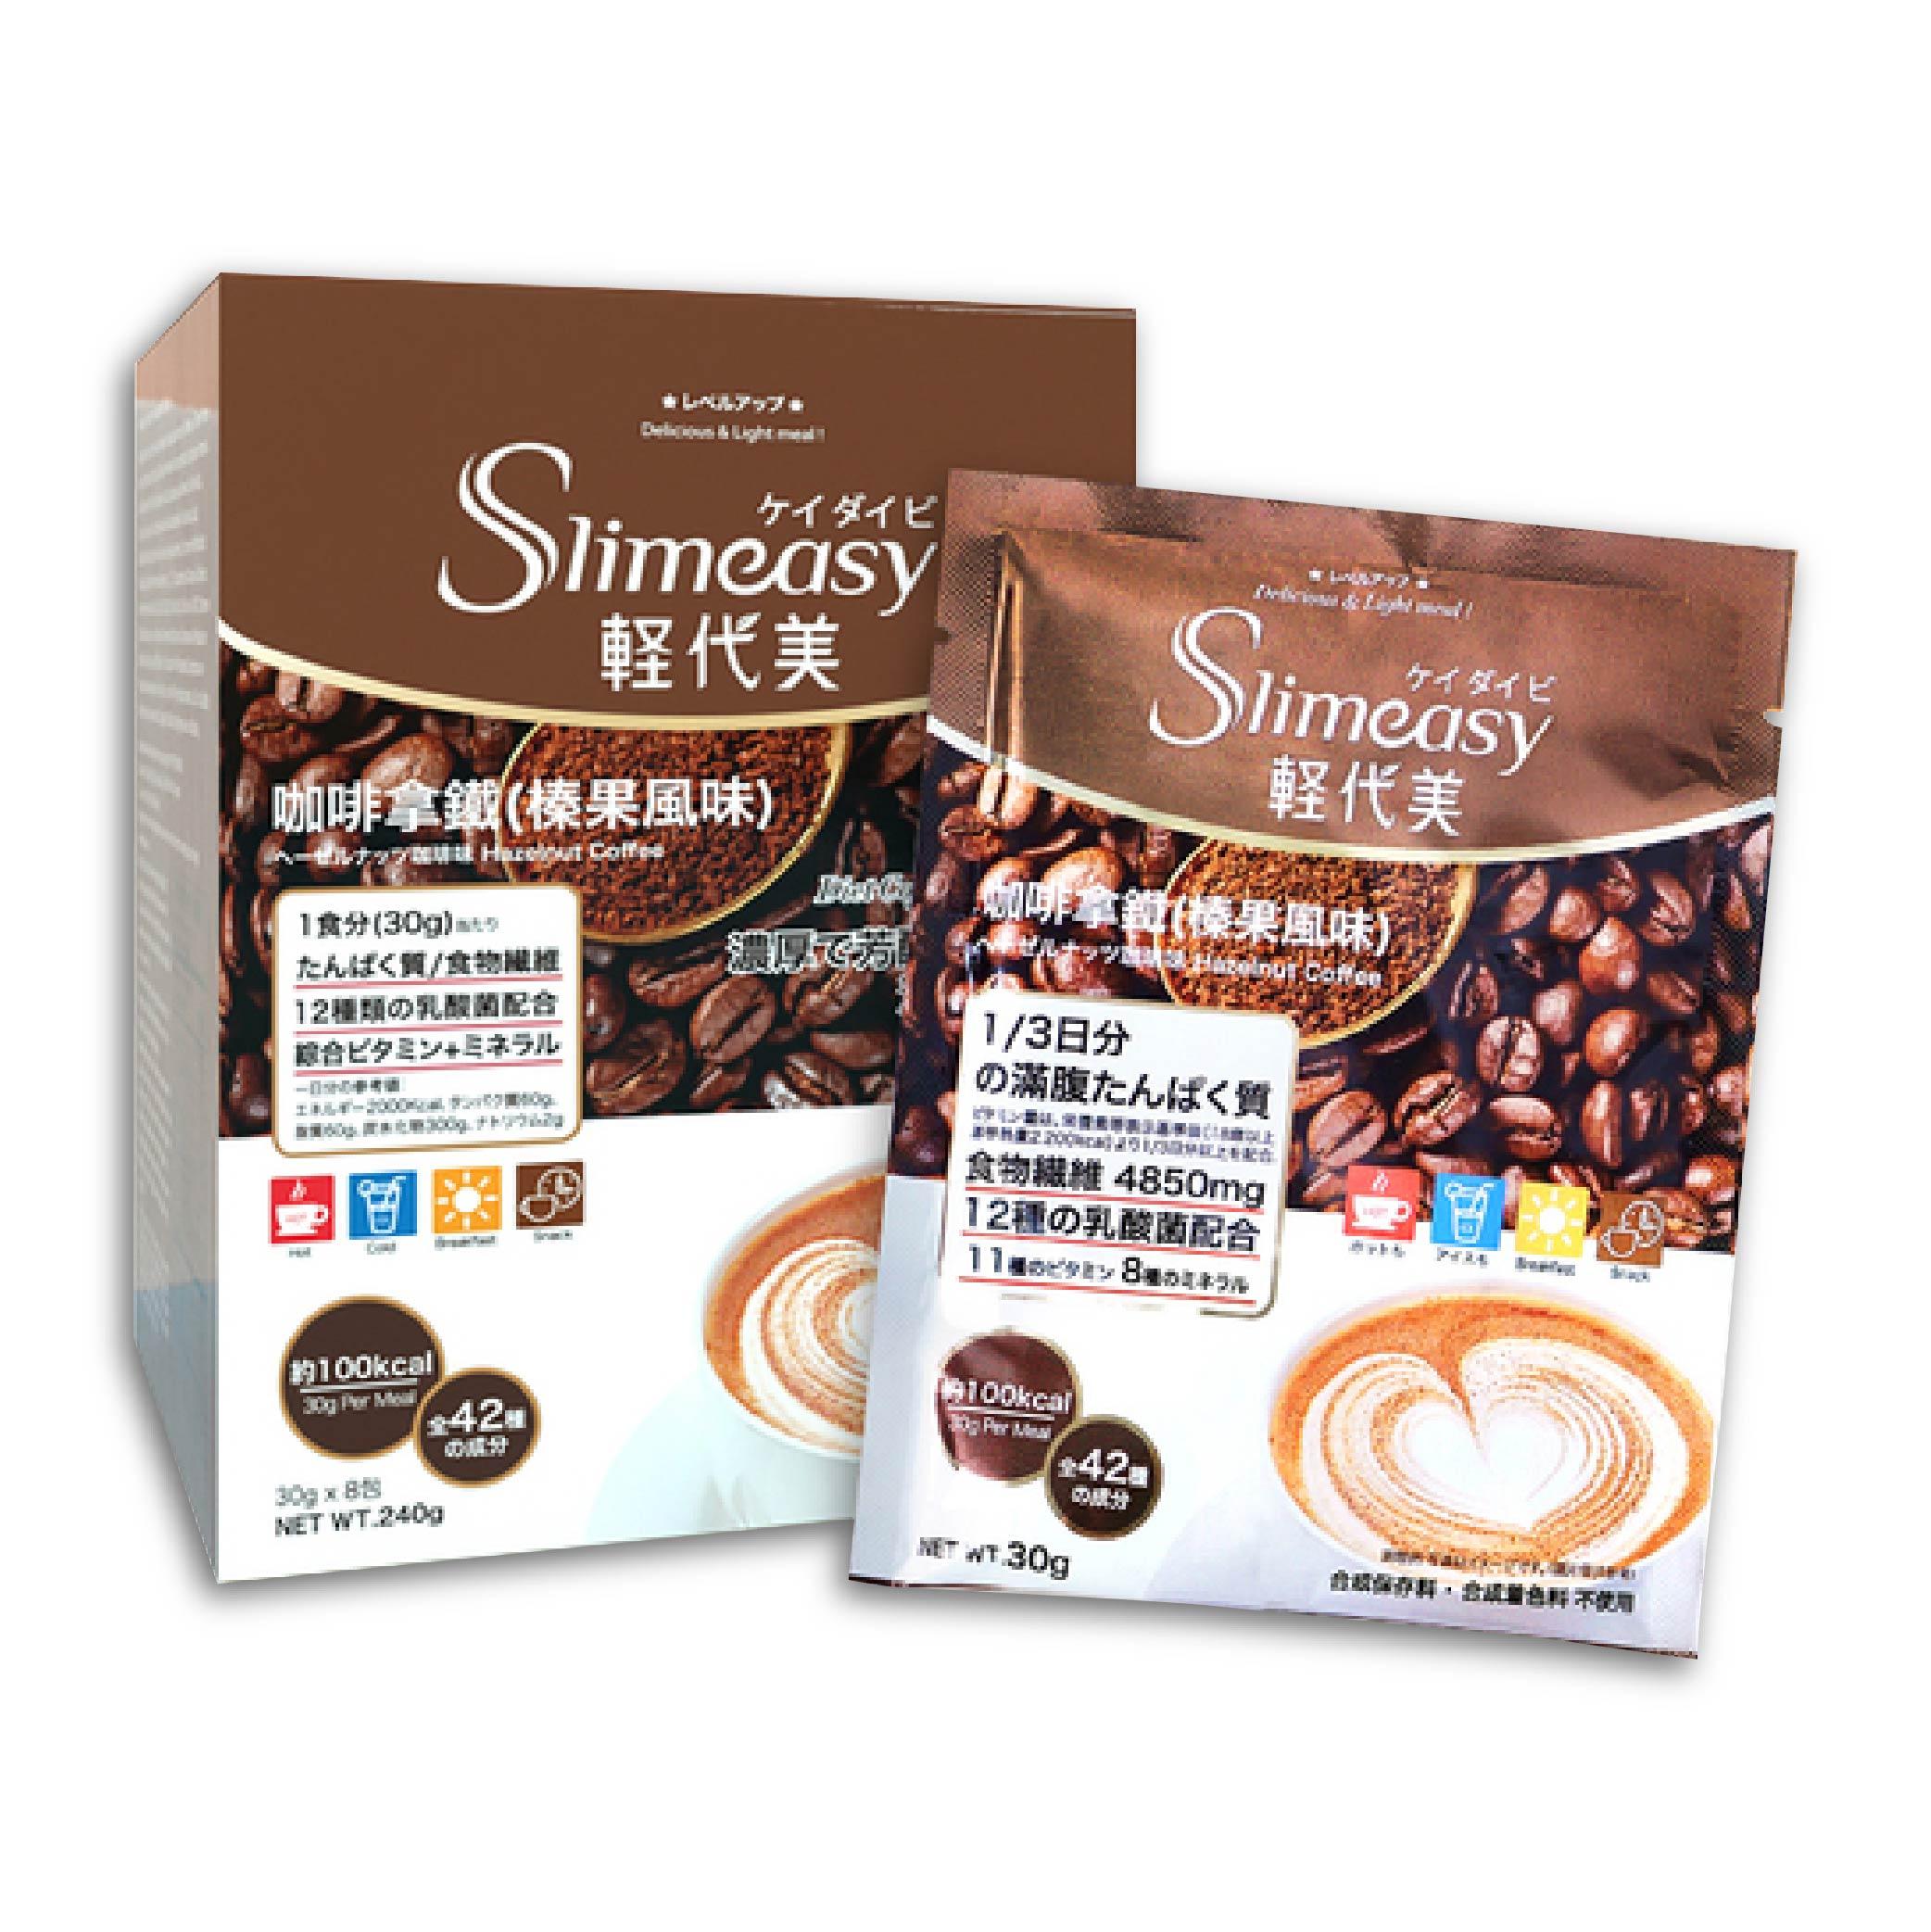 【Slimeasy輕代美】營養代餐 咖啡拿鐵榛果風味 隨身包 (30g/包) 8入